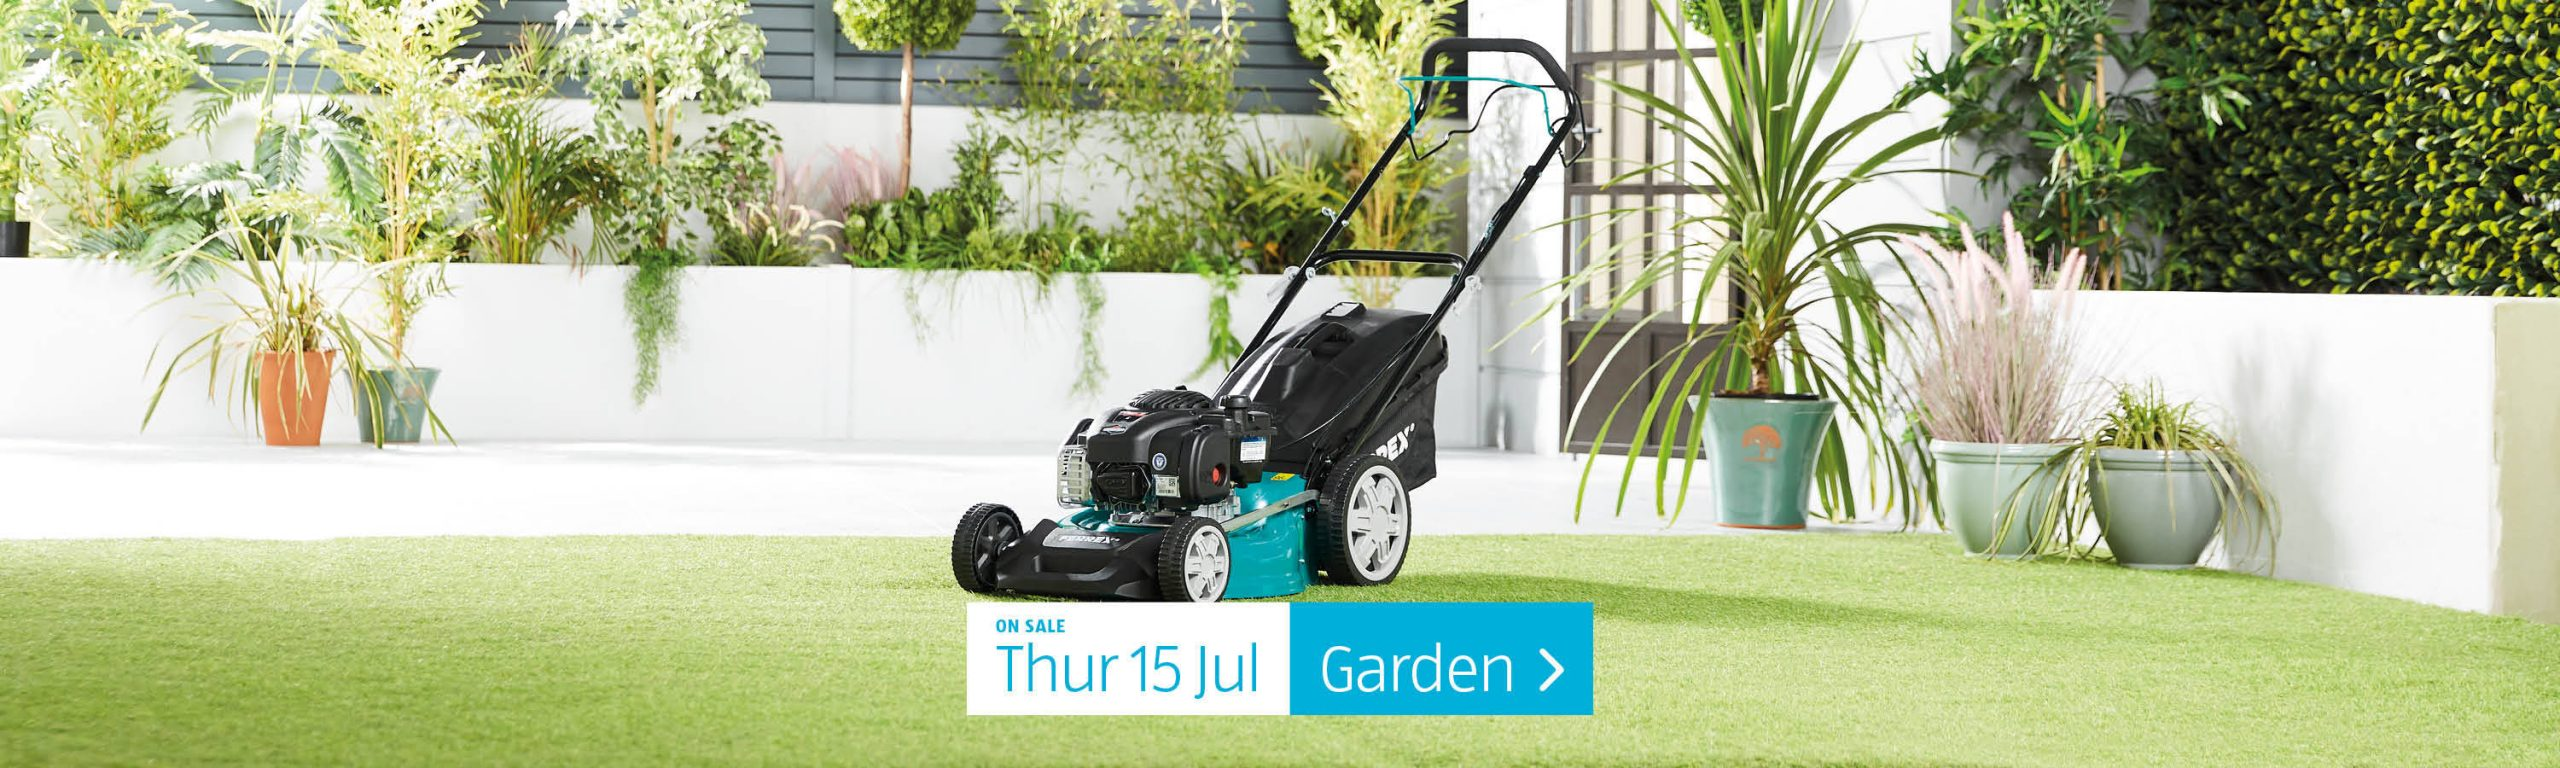 ALDI Thursday Offers 15th July 2021 ALDI Garden